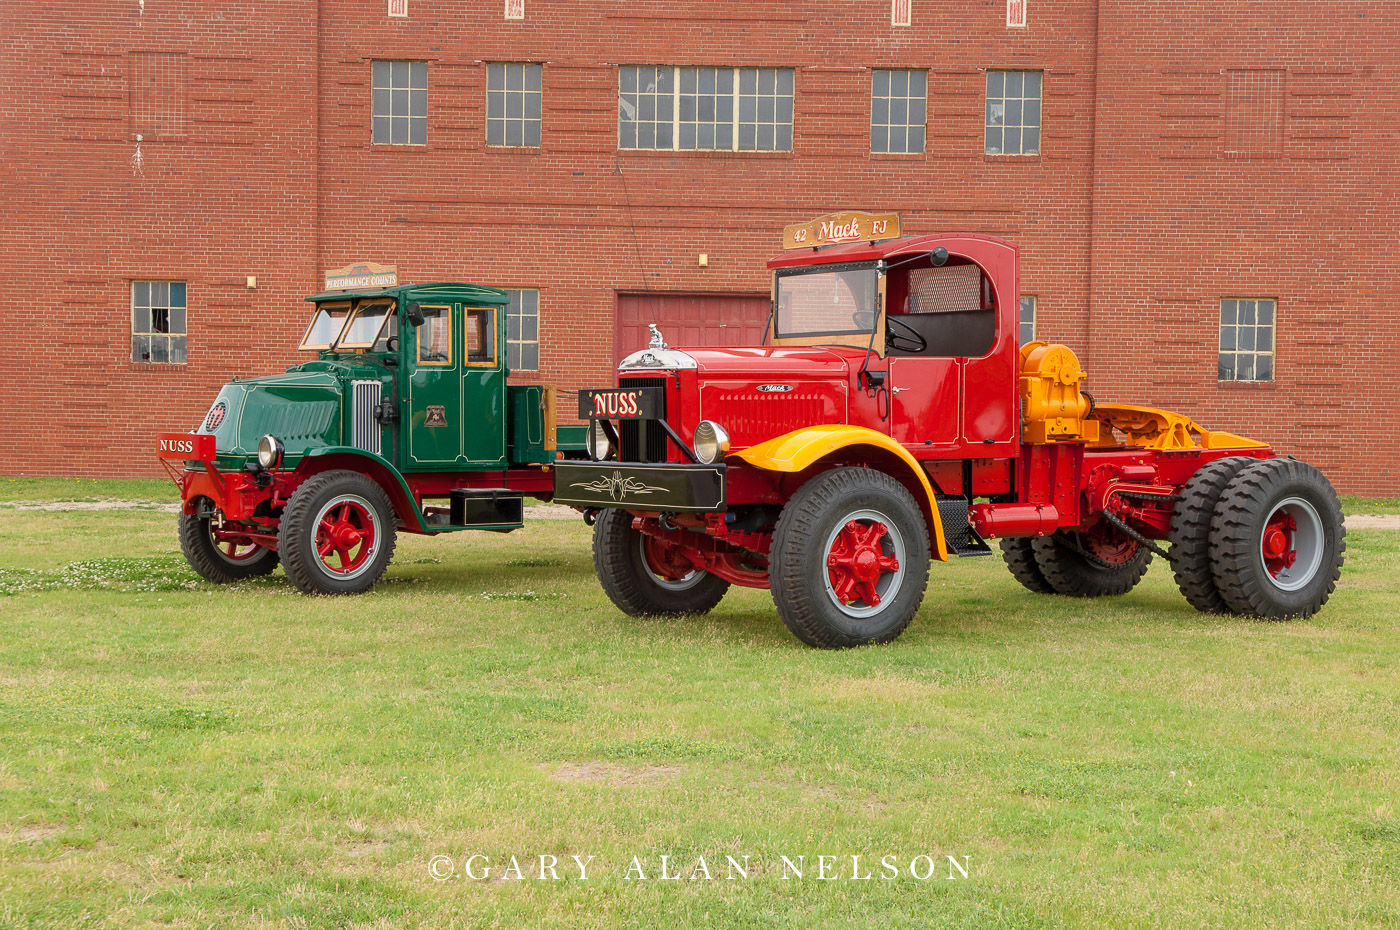 VT-08-84-MA 1942 Mack  FJ (red) and 1923 Mack AC